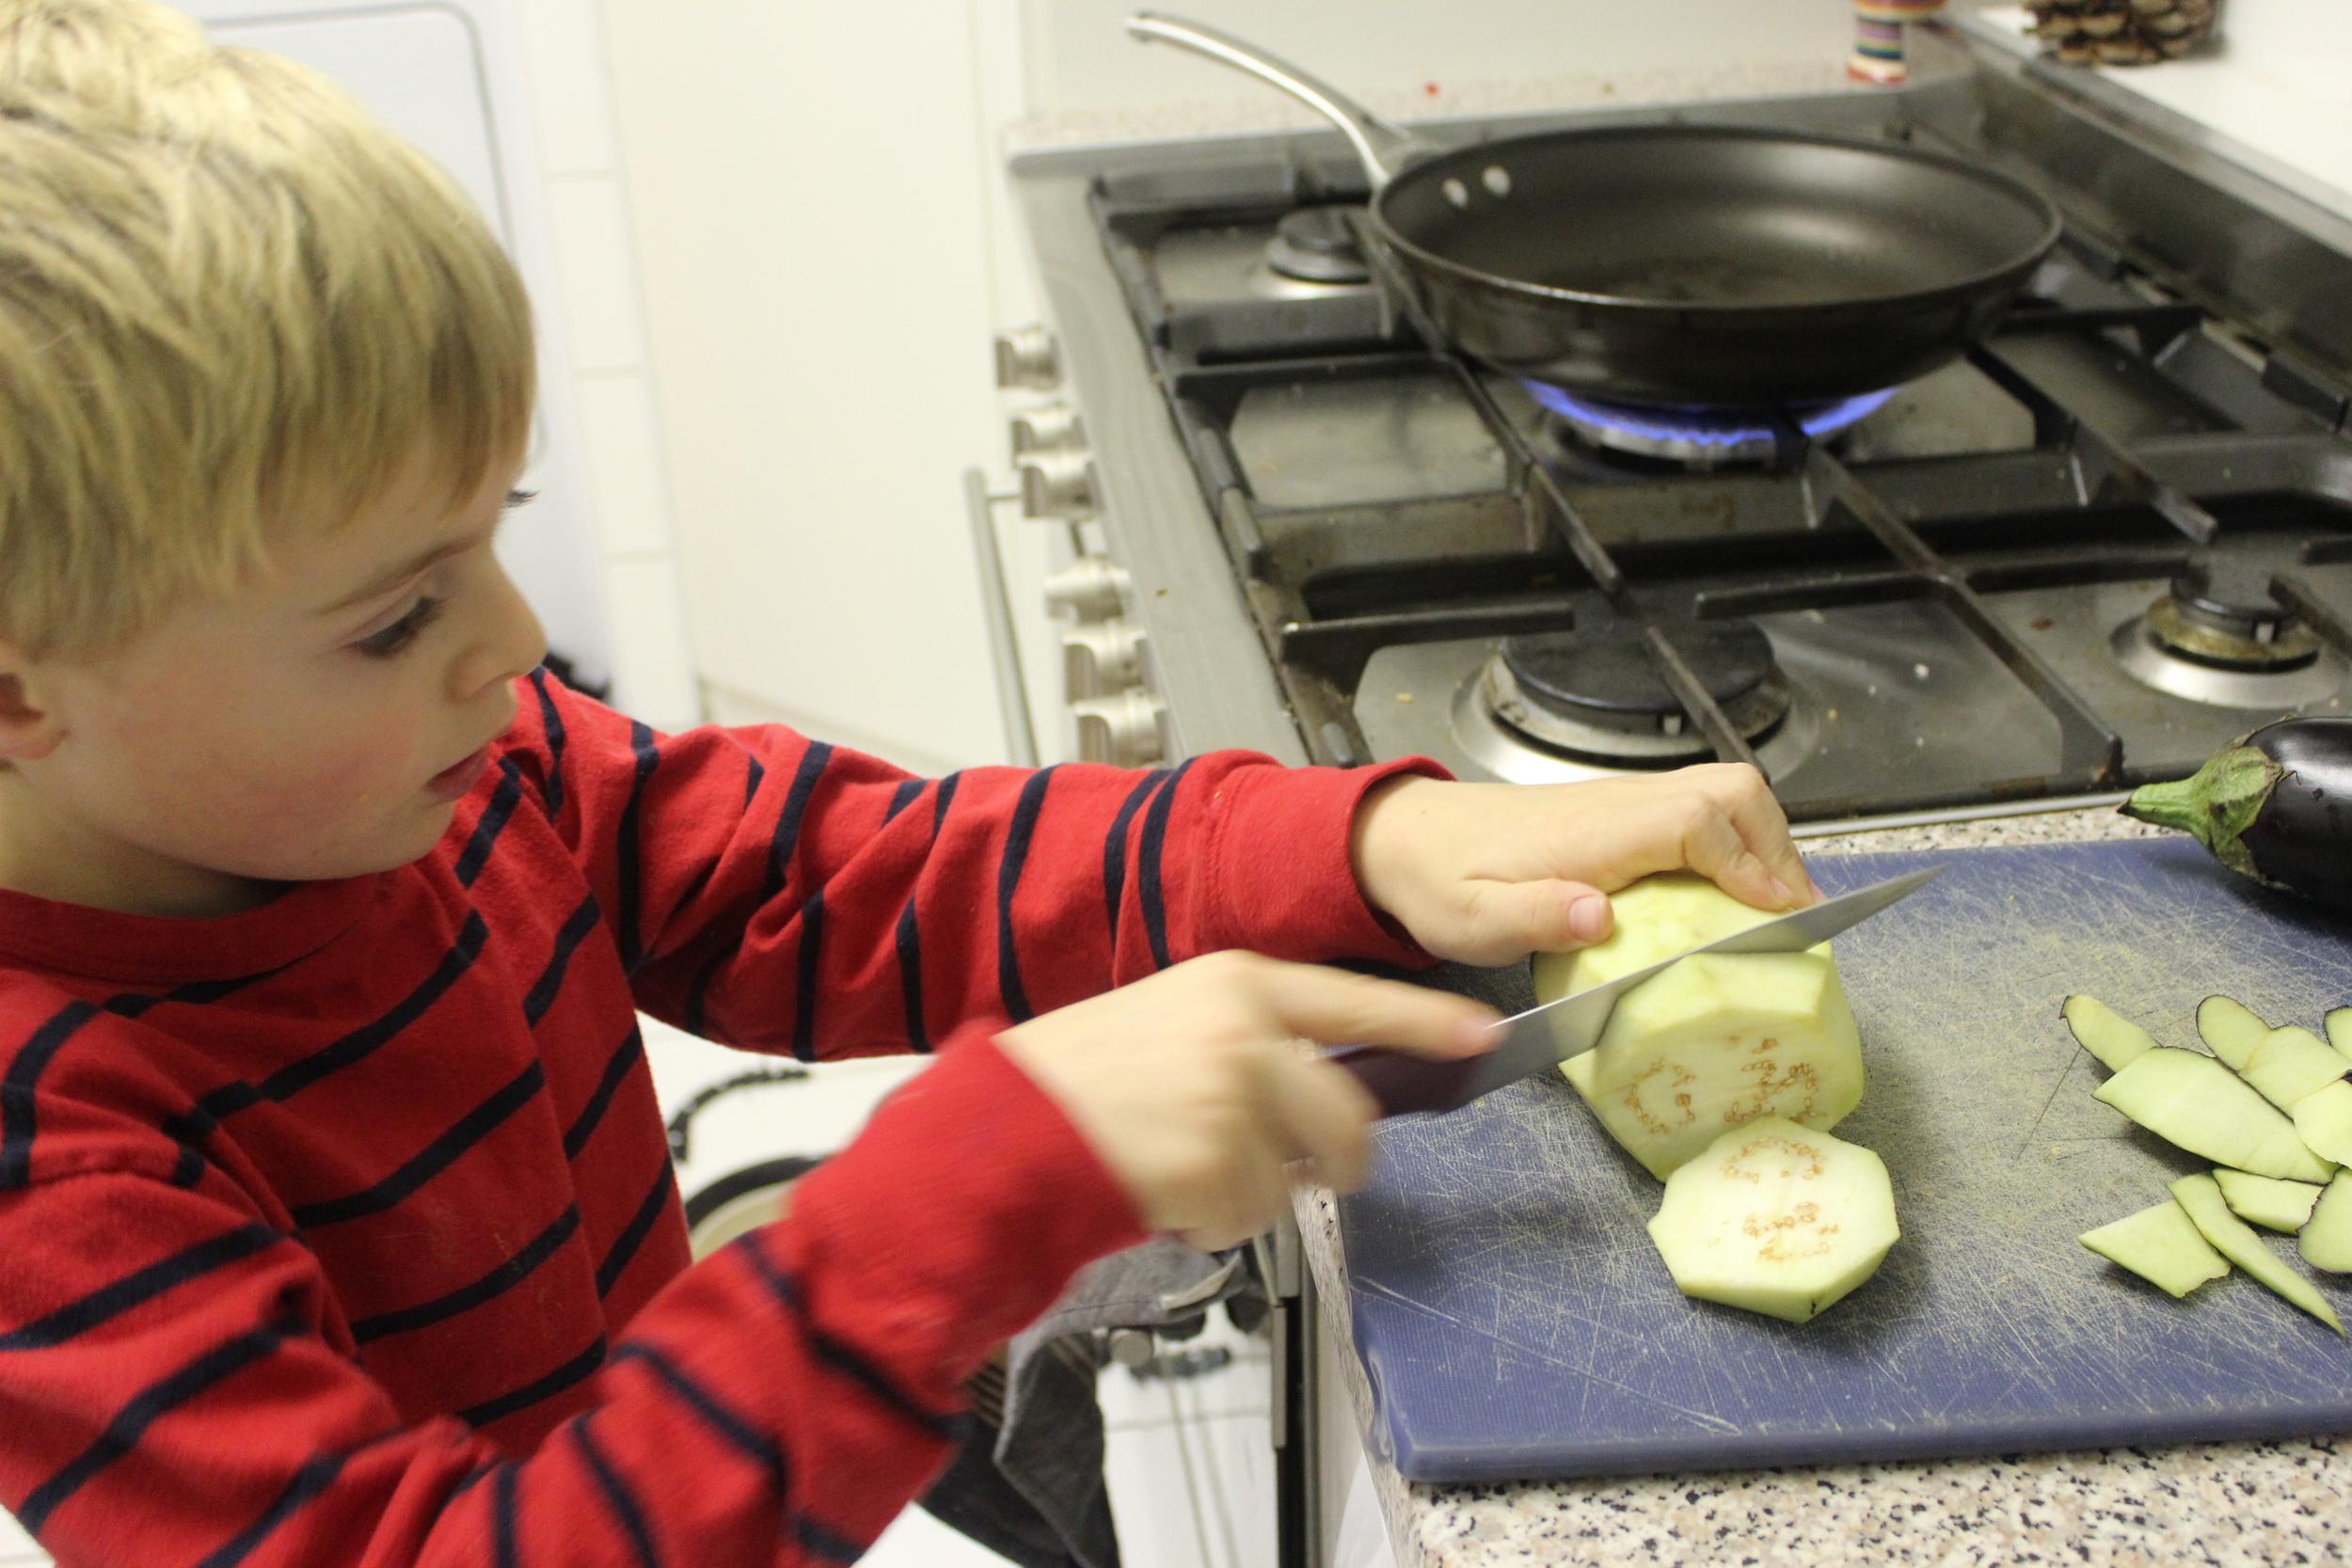 Cutting the peeled eggplant.